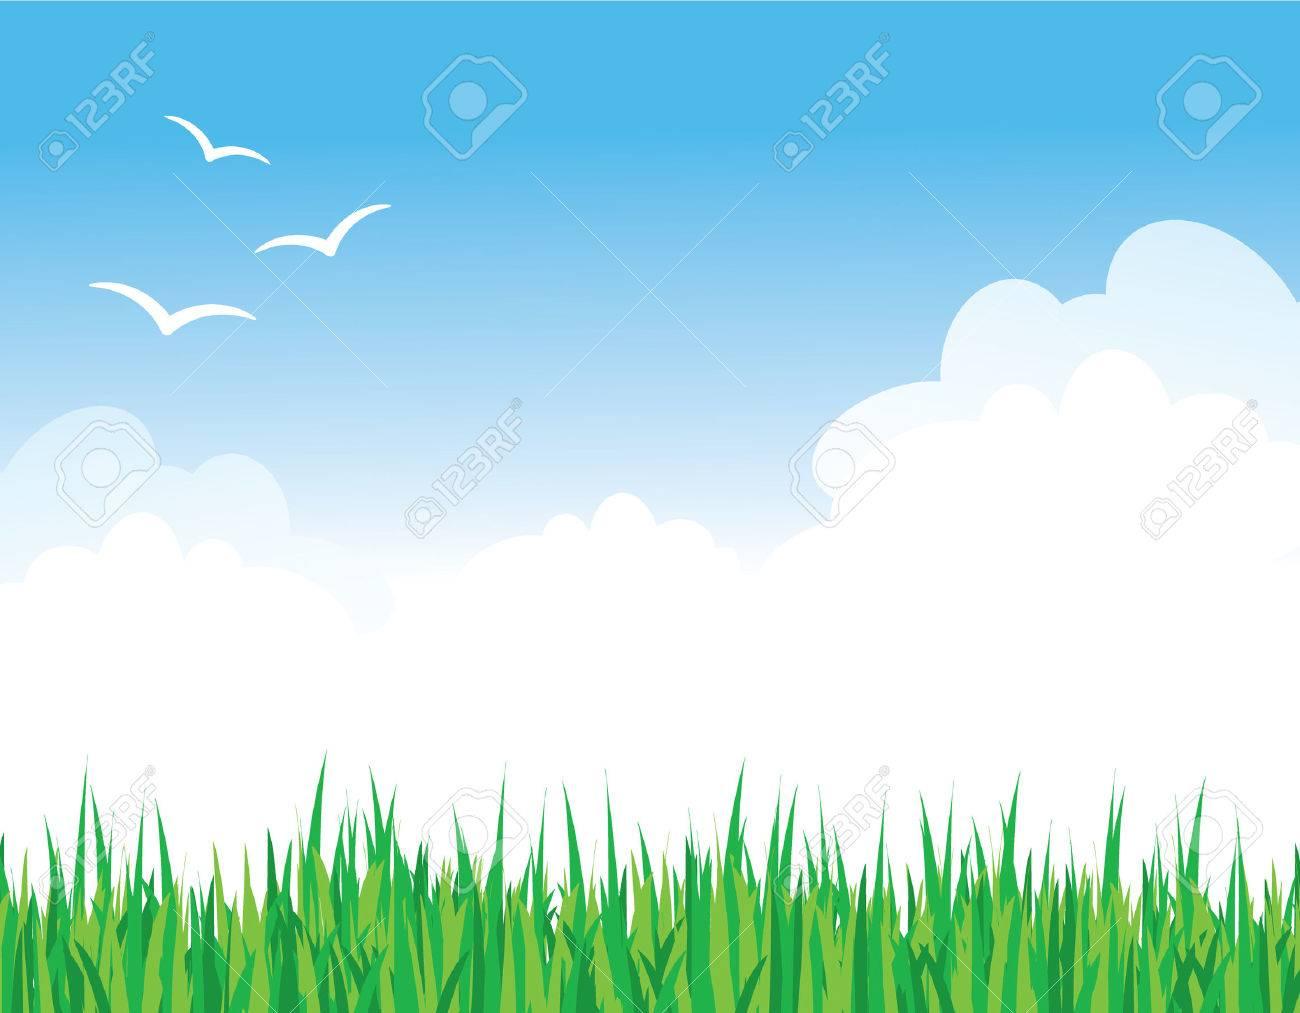 Green Grass Against a Blue Sky Stock Vector - 4808209